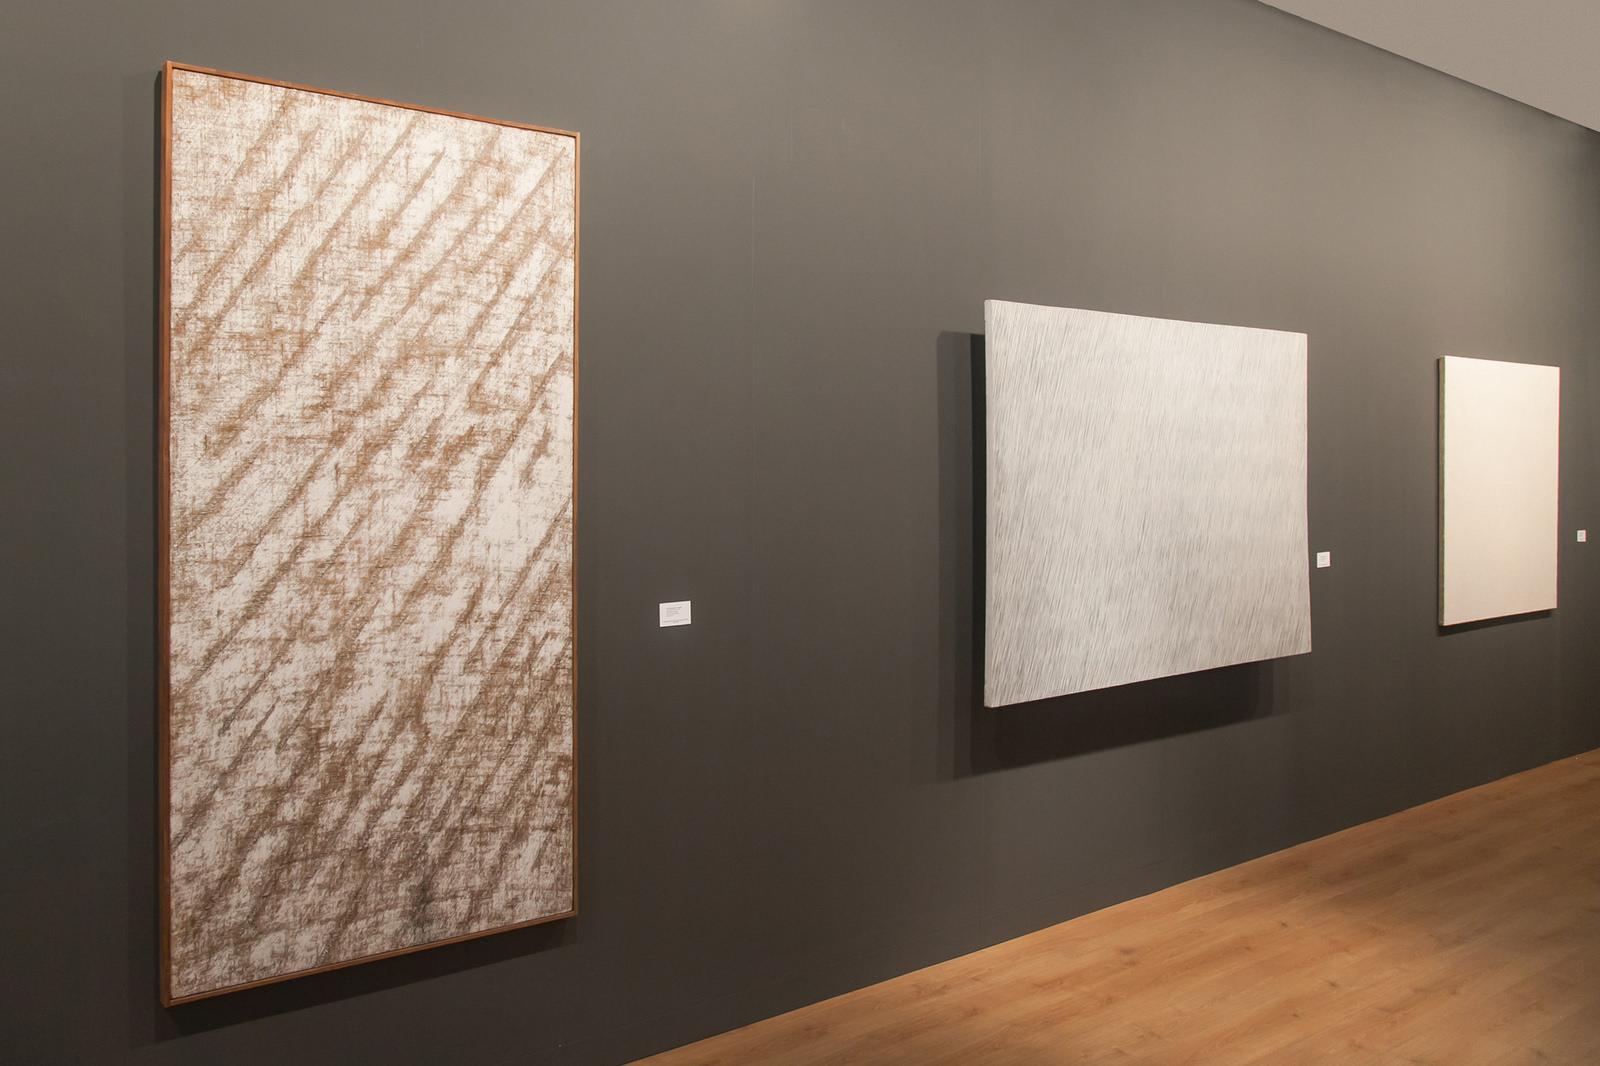 Image: Exhibition view, Tina Kim and Kukje Gallery at Art Basel 2016. Photo: © Timothée Chambovet & Ocula.